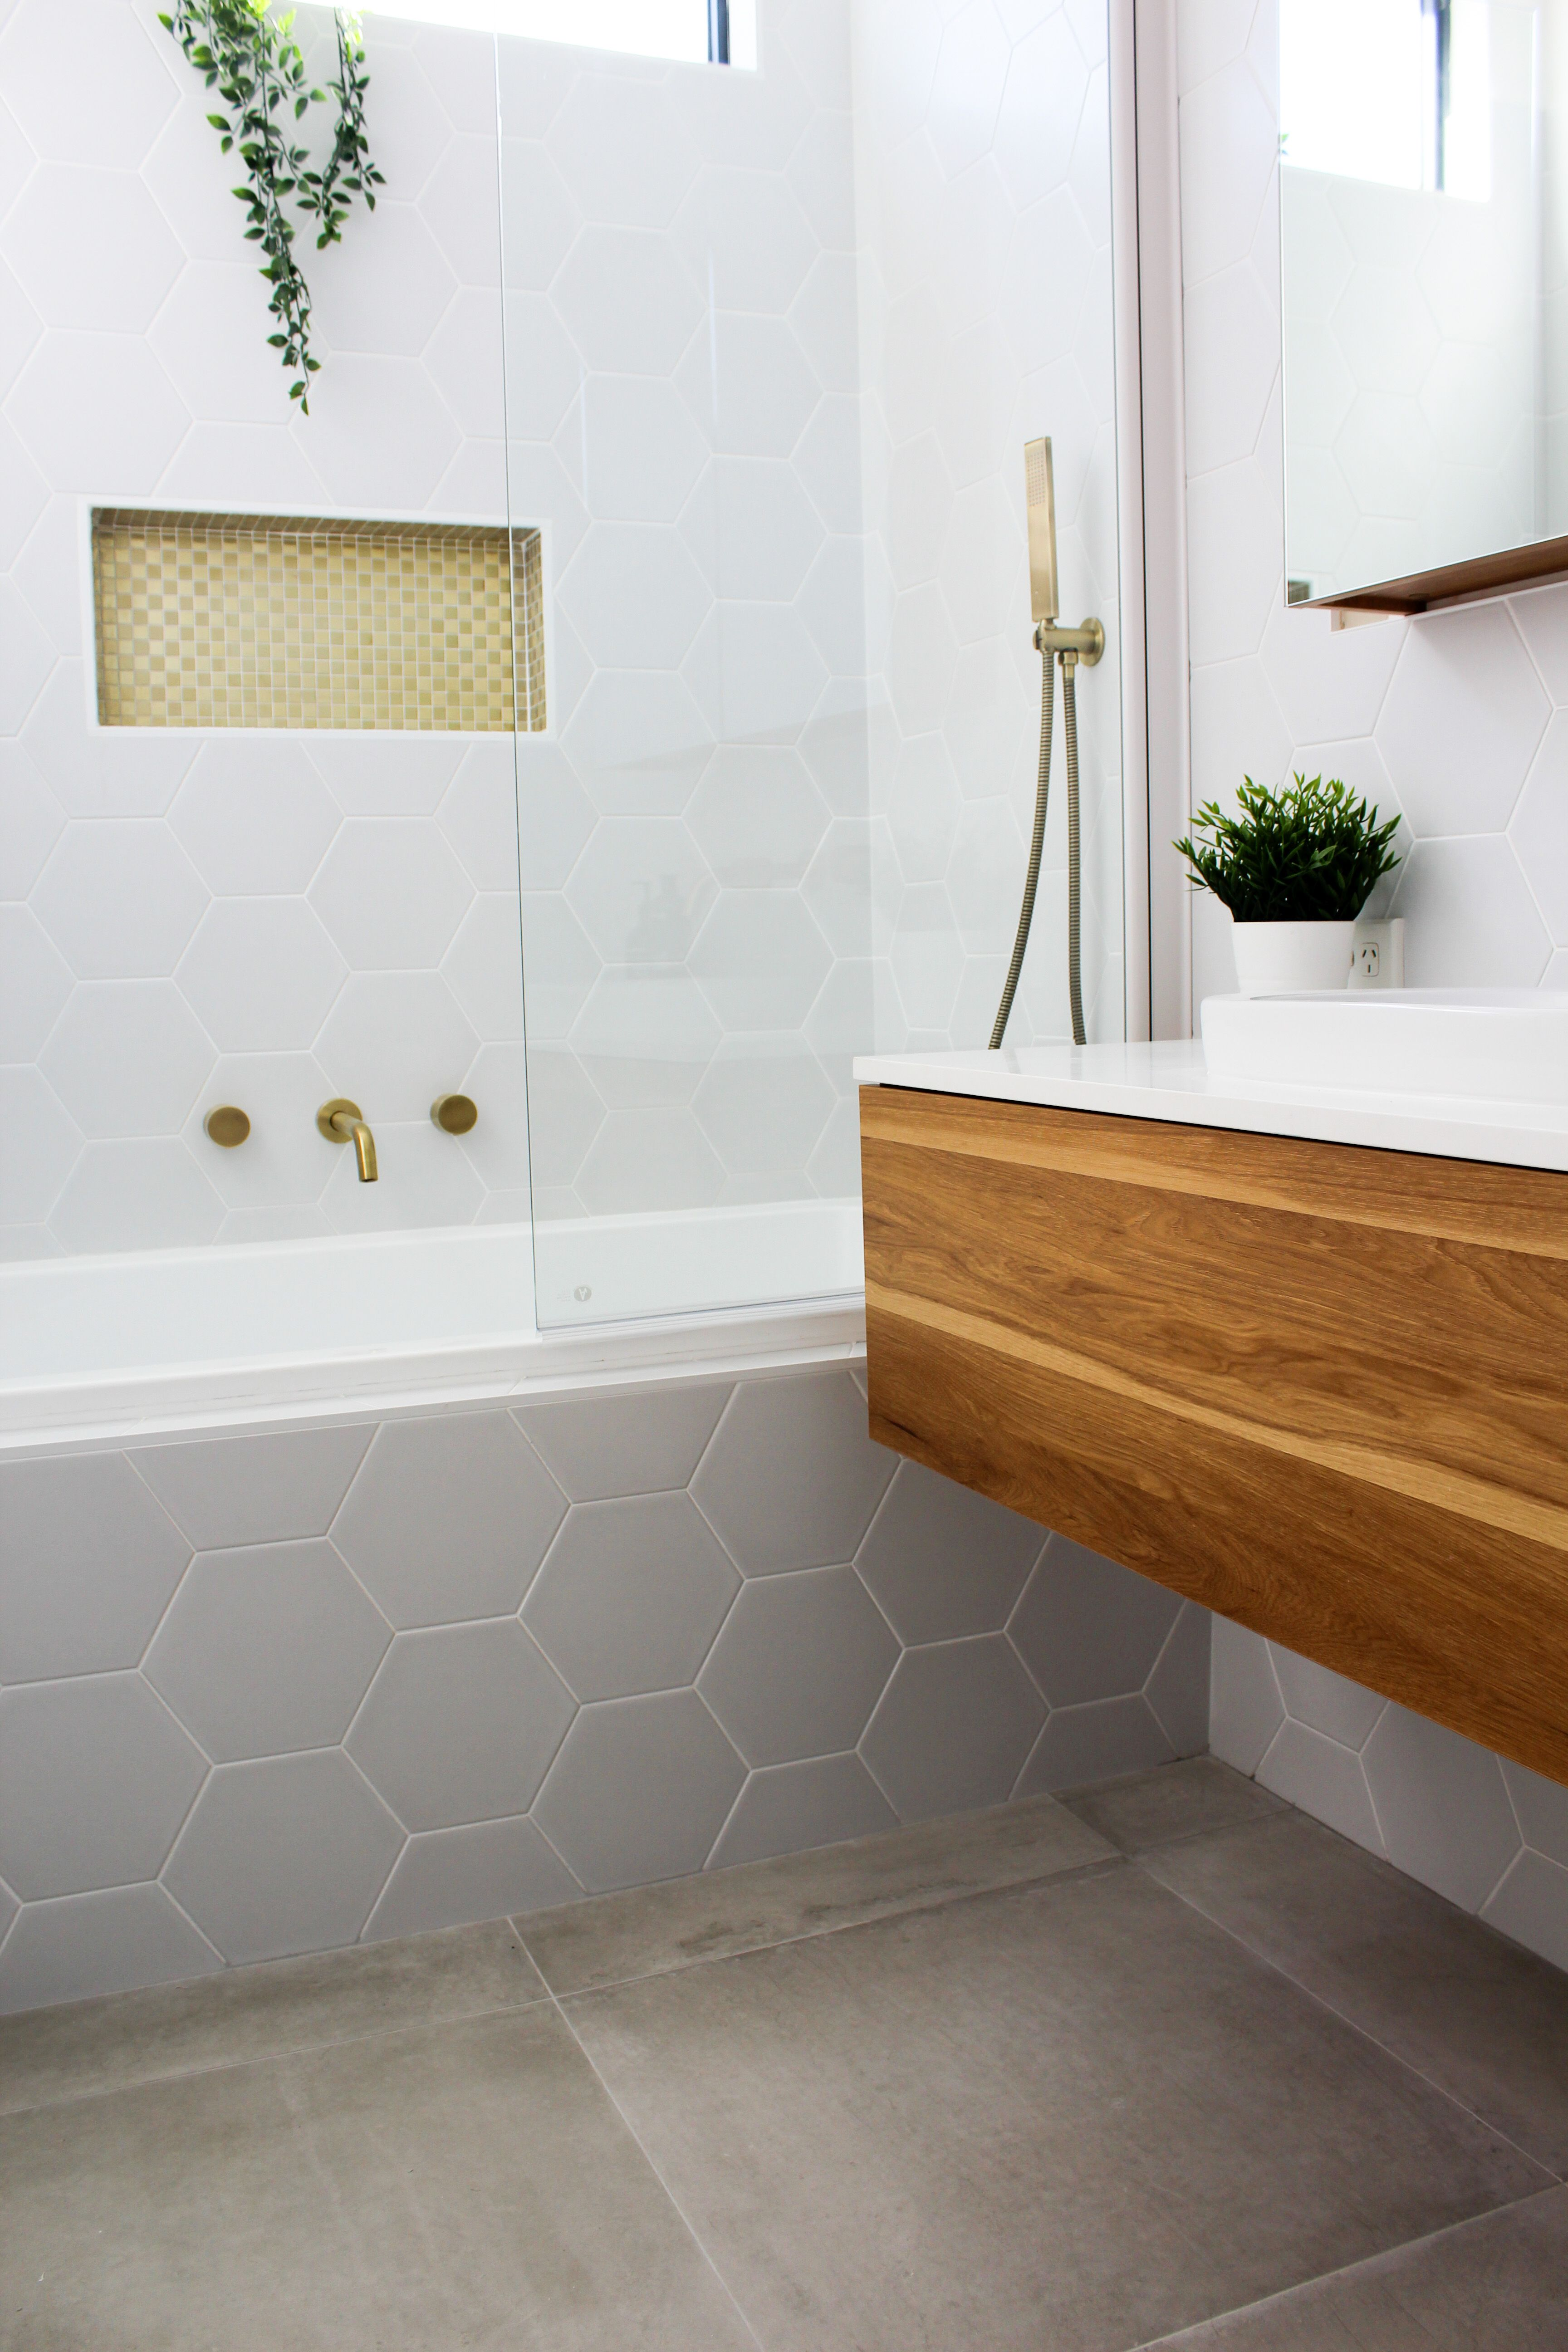 Shower Bath Shower Over Bath Bathroom Renovation Trends Shower Niche